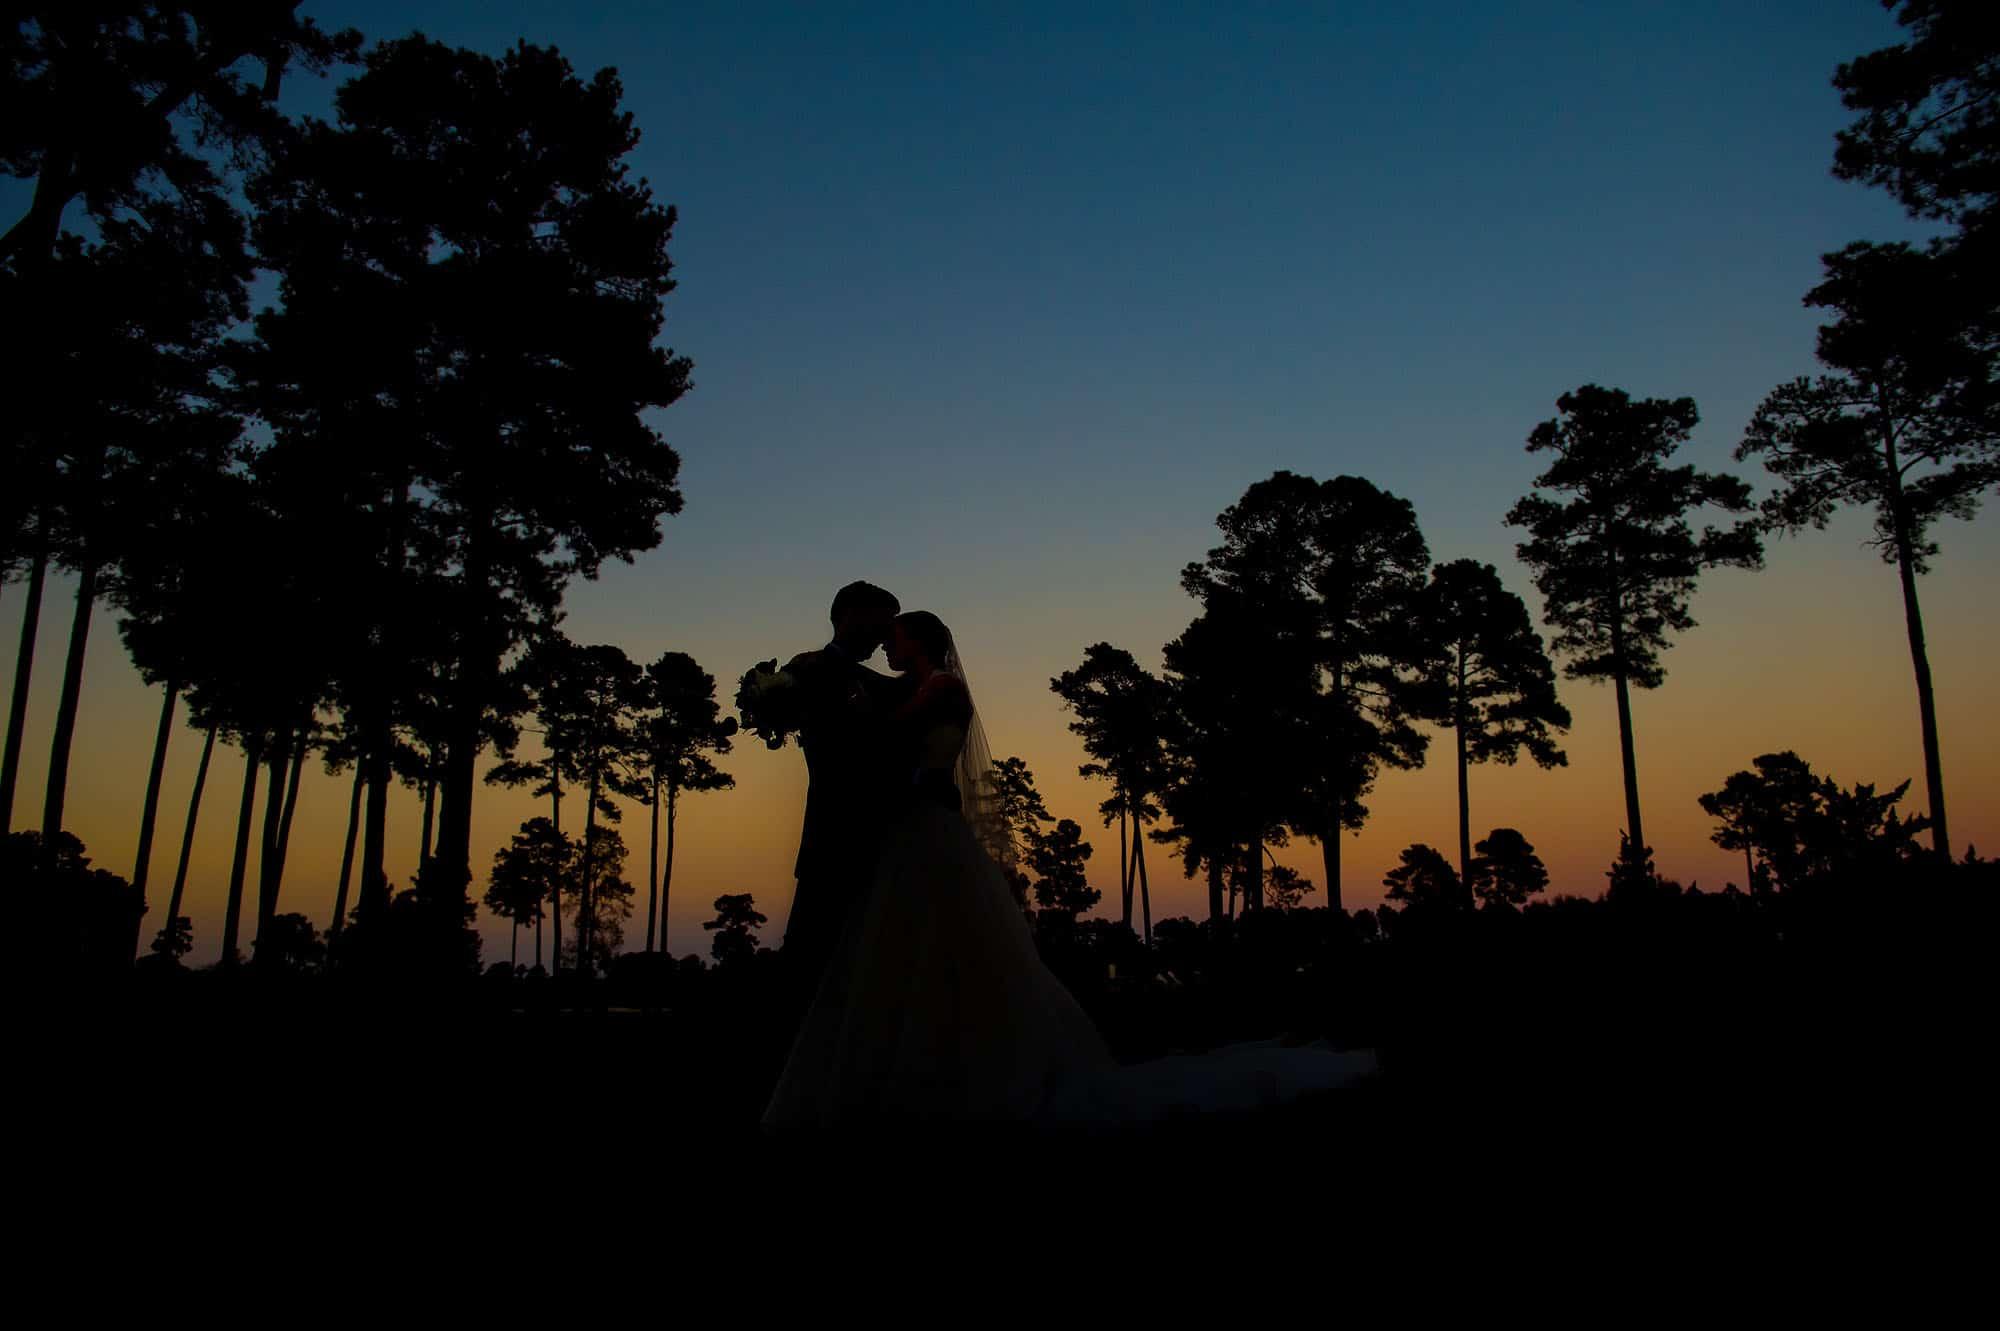 Prestonwood Country Club Weddings | Cary, NC